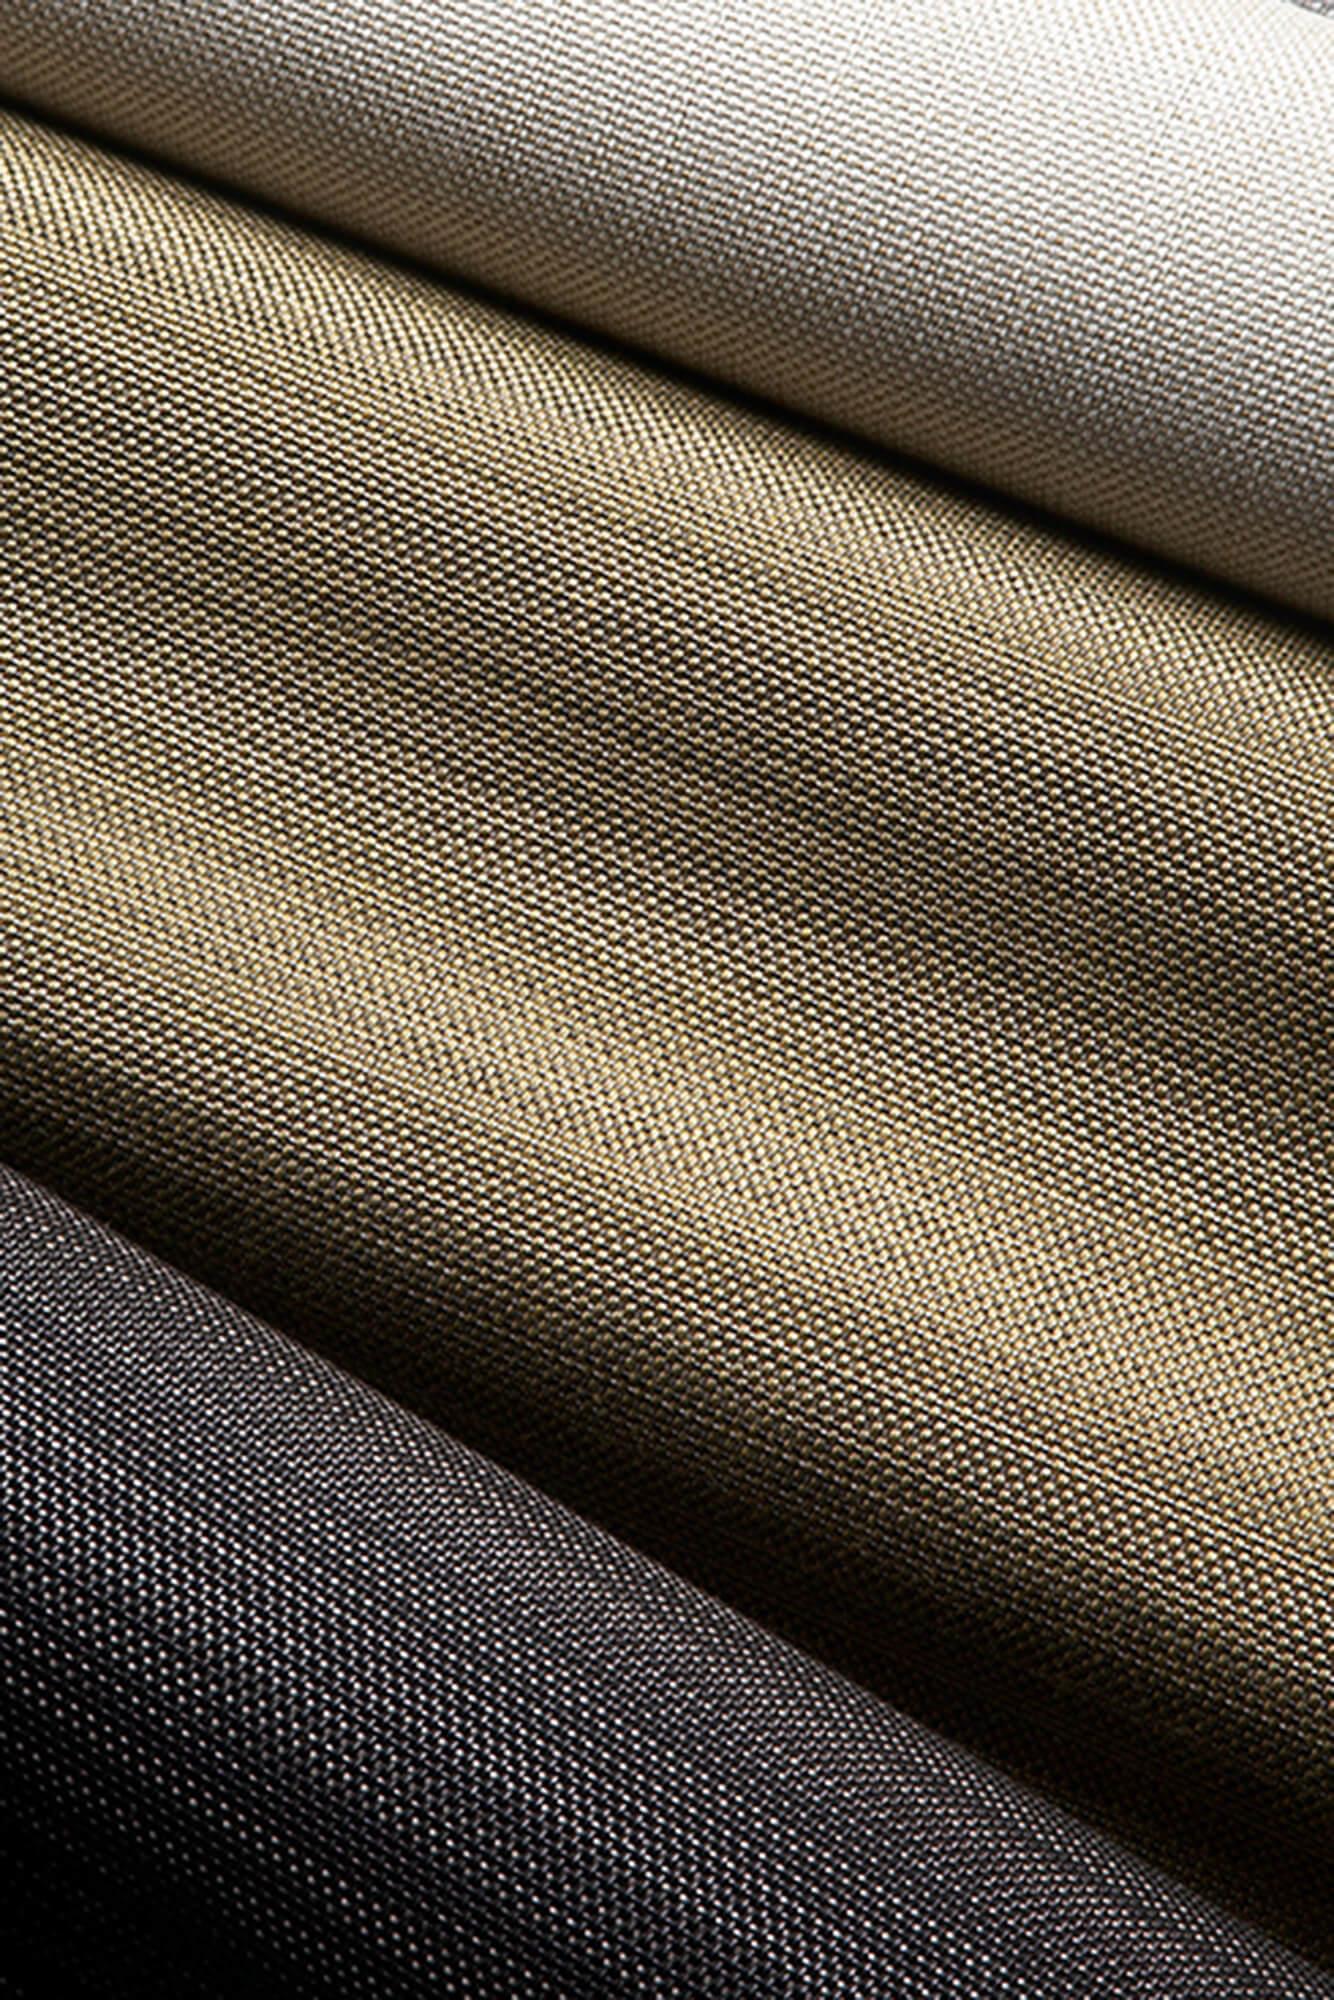 Immagine affascinante dei tessuti metallici Sunbrella Alloy